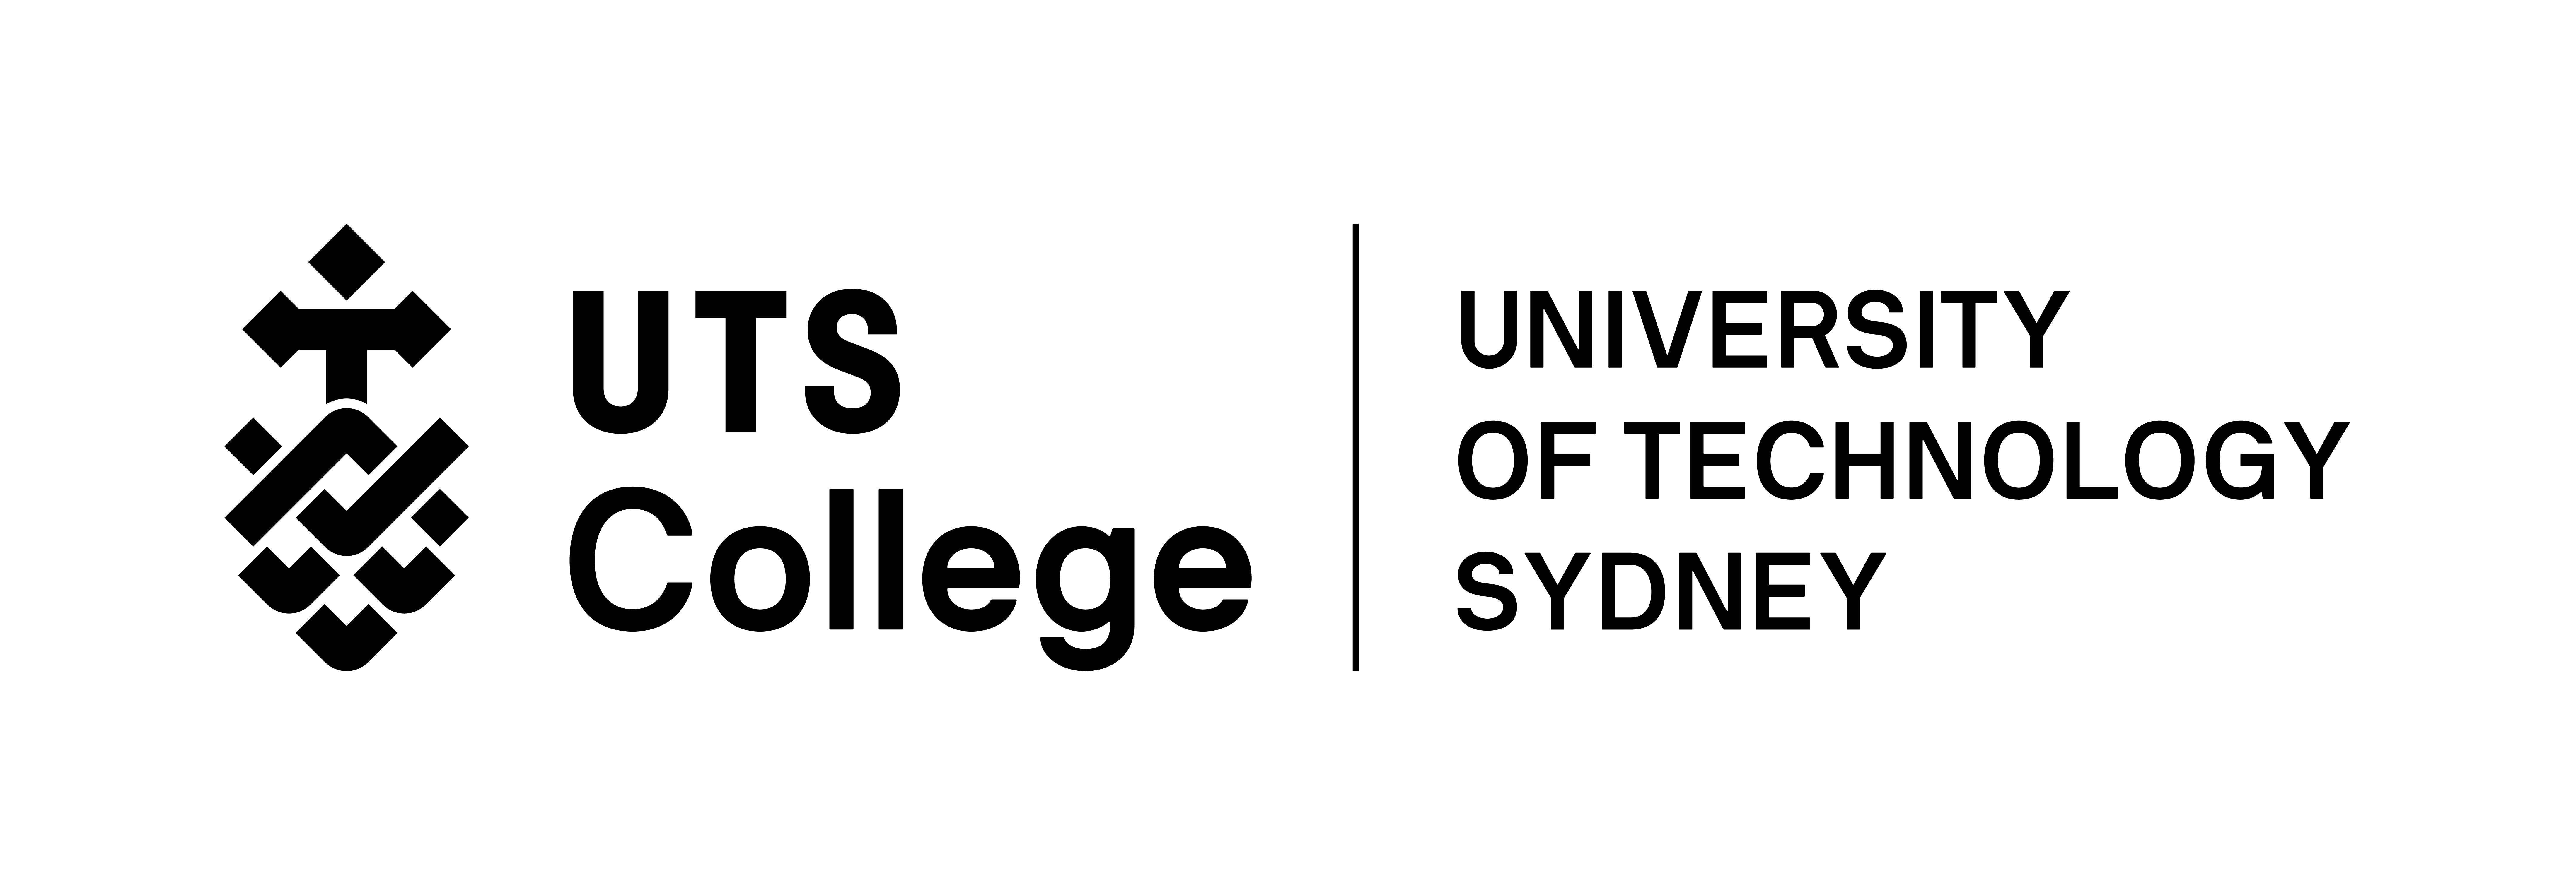 UTS Insearch (The University of Technology, Sydney)